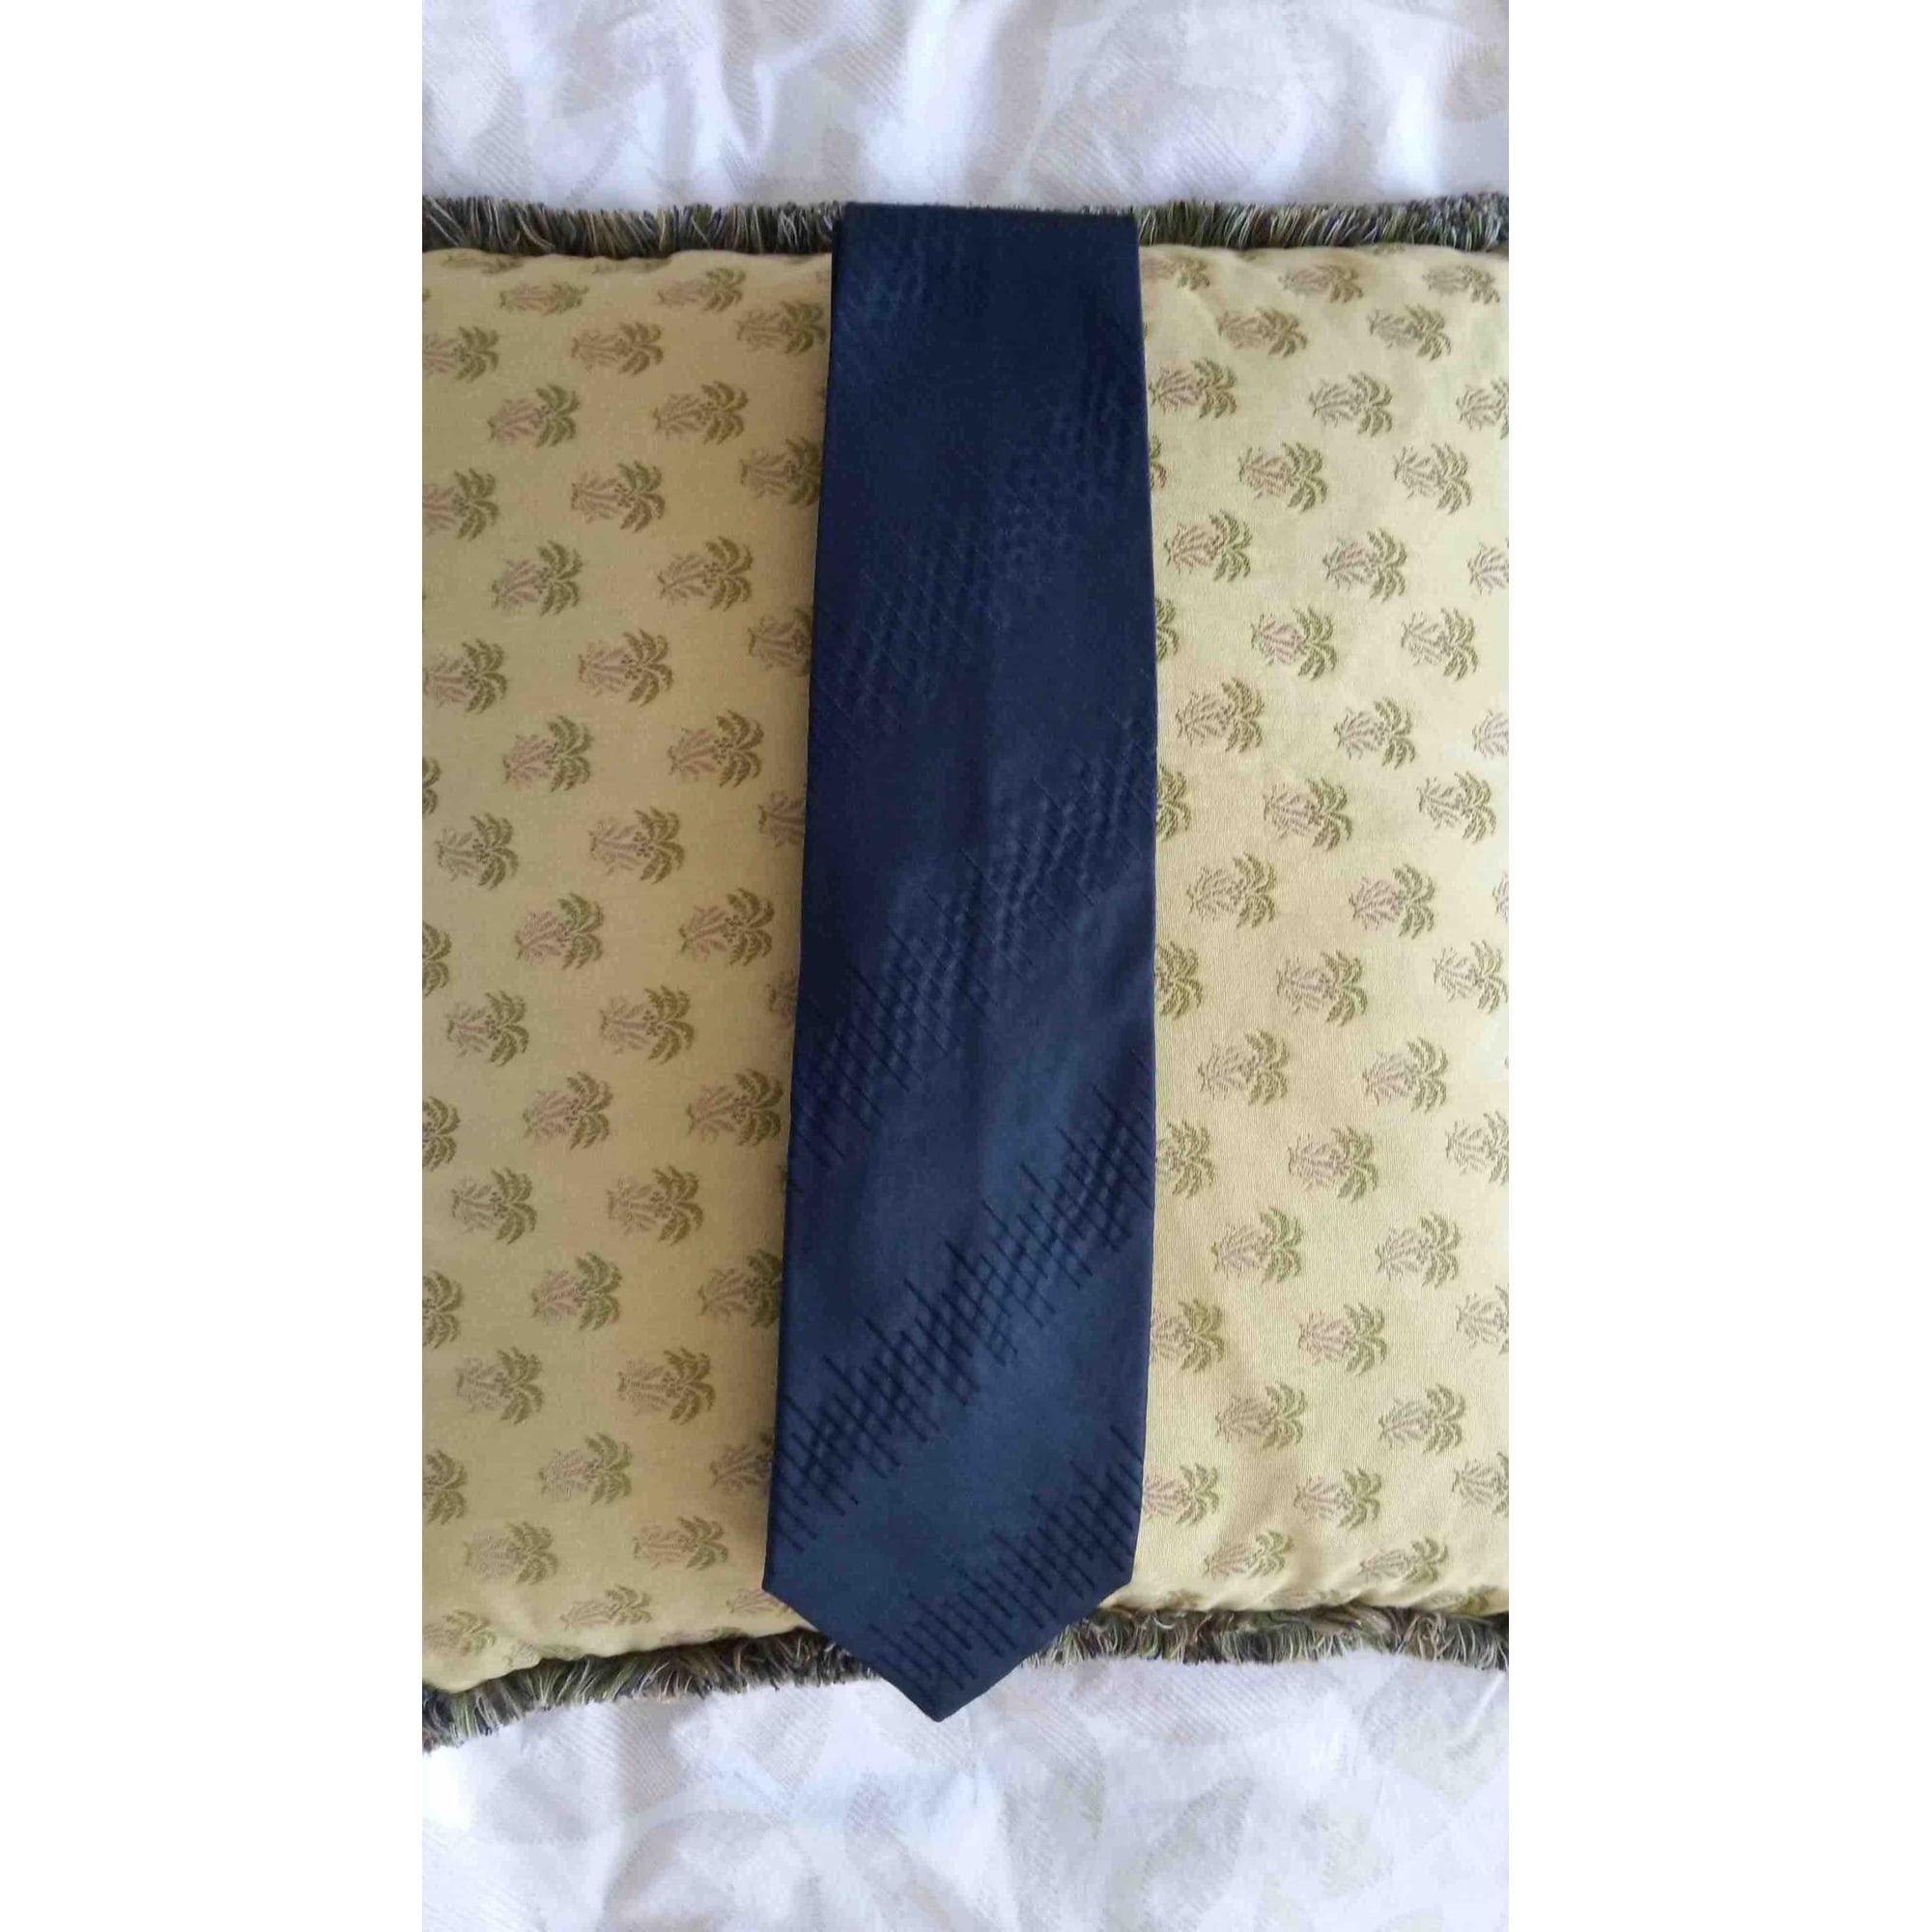 Cravate EMPORIO ARMANI Bleu, bleu marine, bleu turquoise